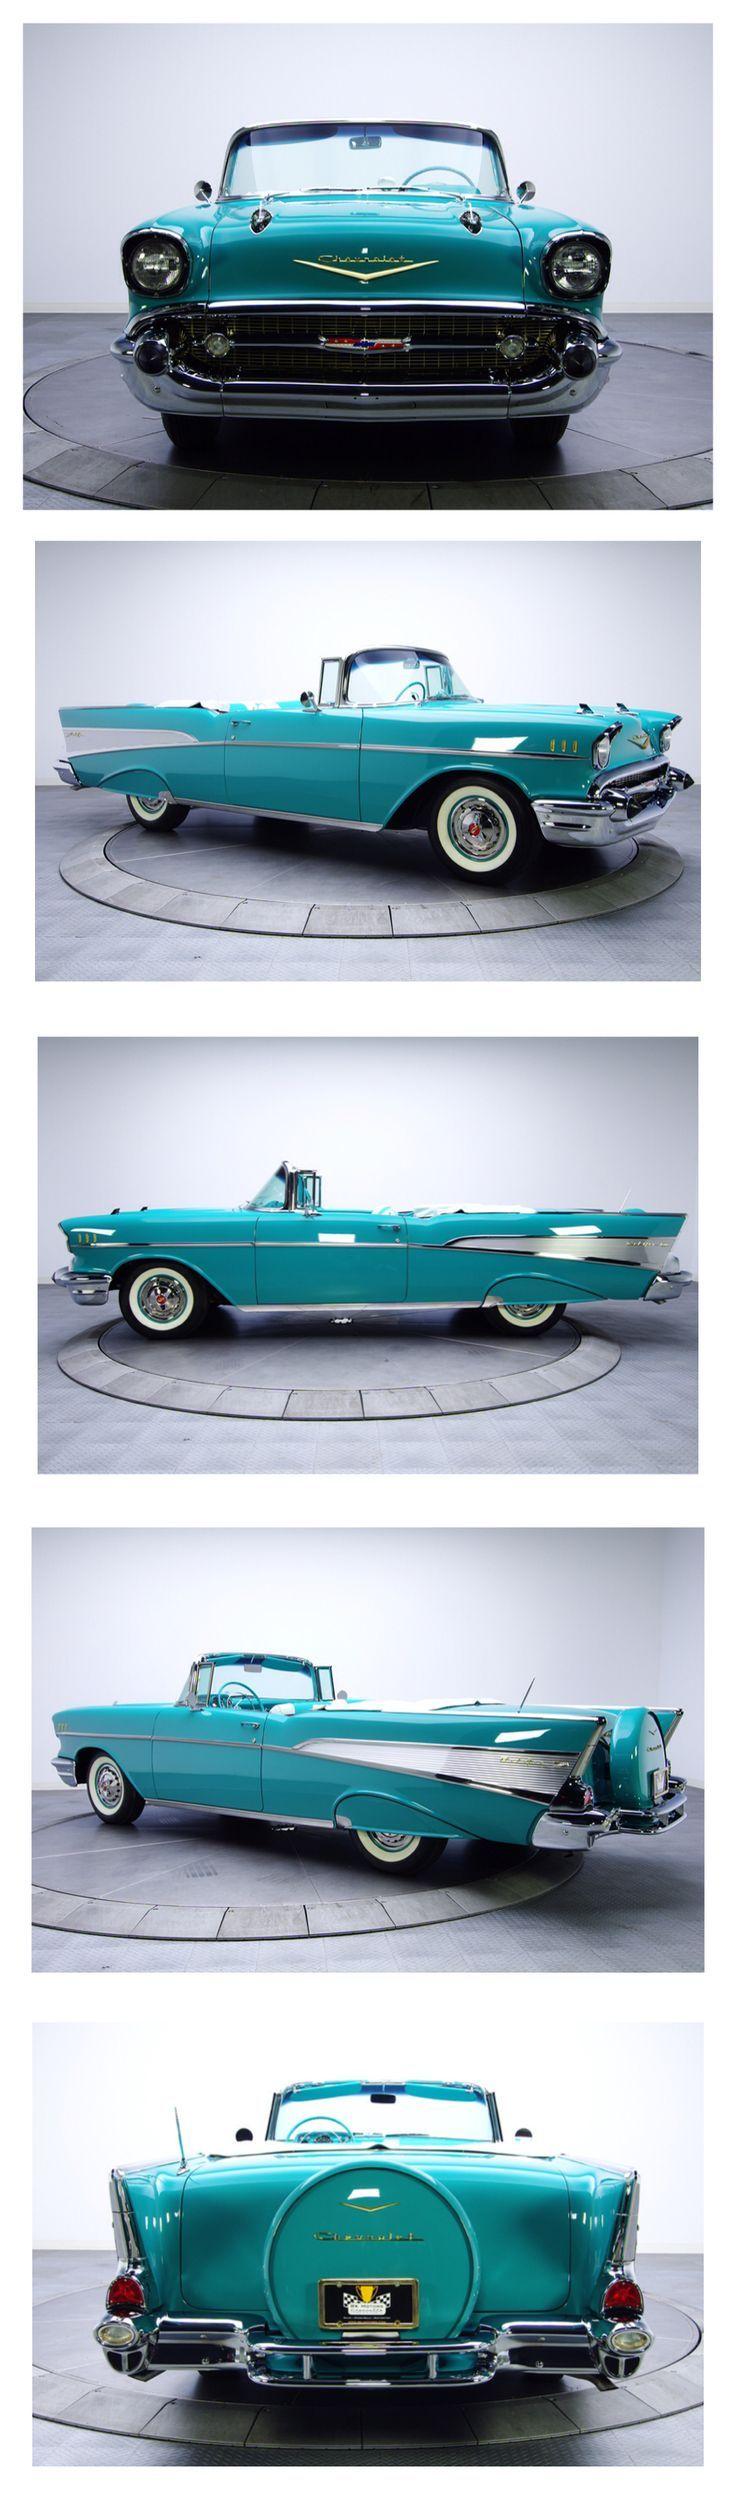 Visit The MACHINE Shop Café... ❤ Best of Chevy @ MACHINE ❤ (1957 Chevy Bel Air Roadster)